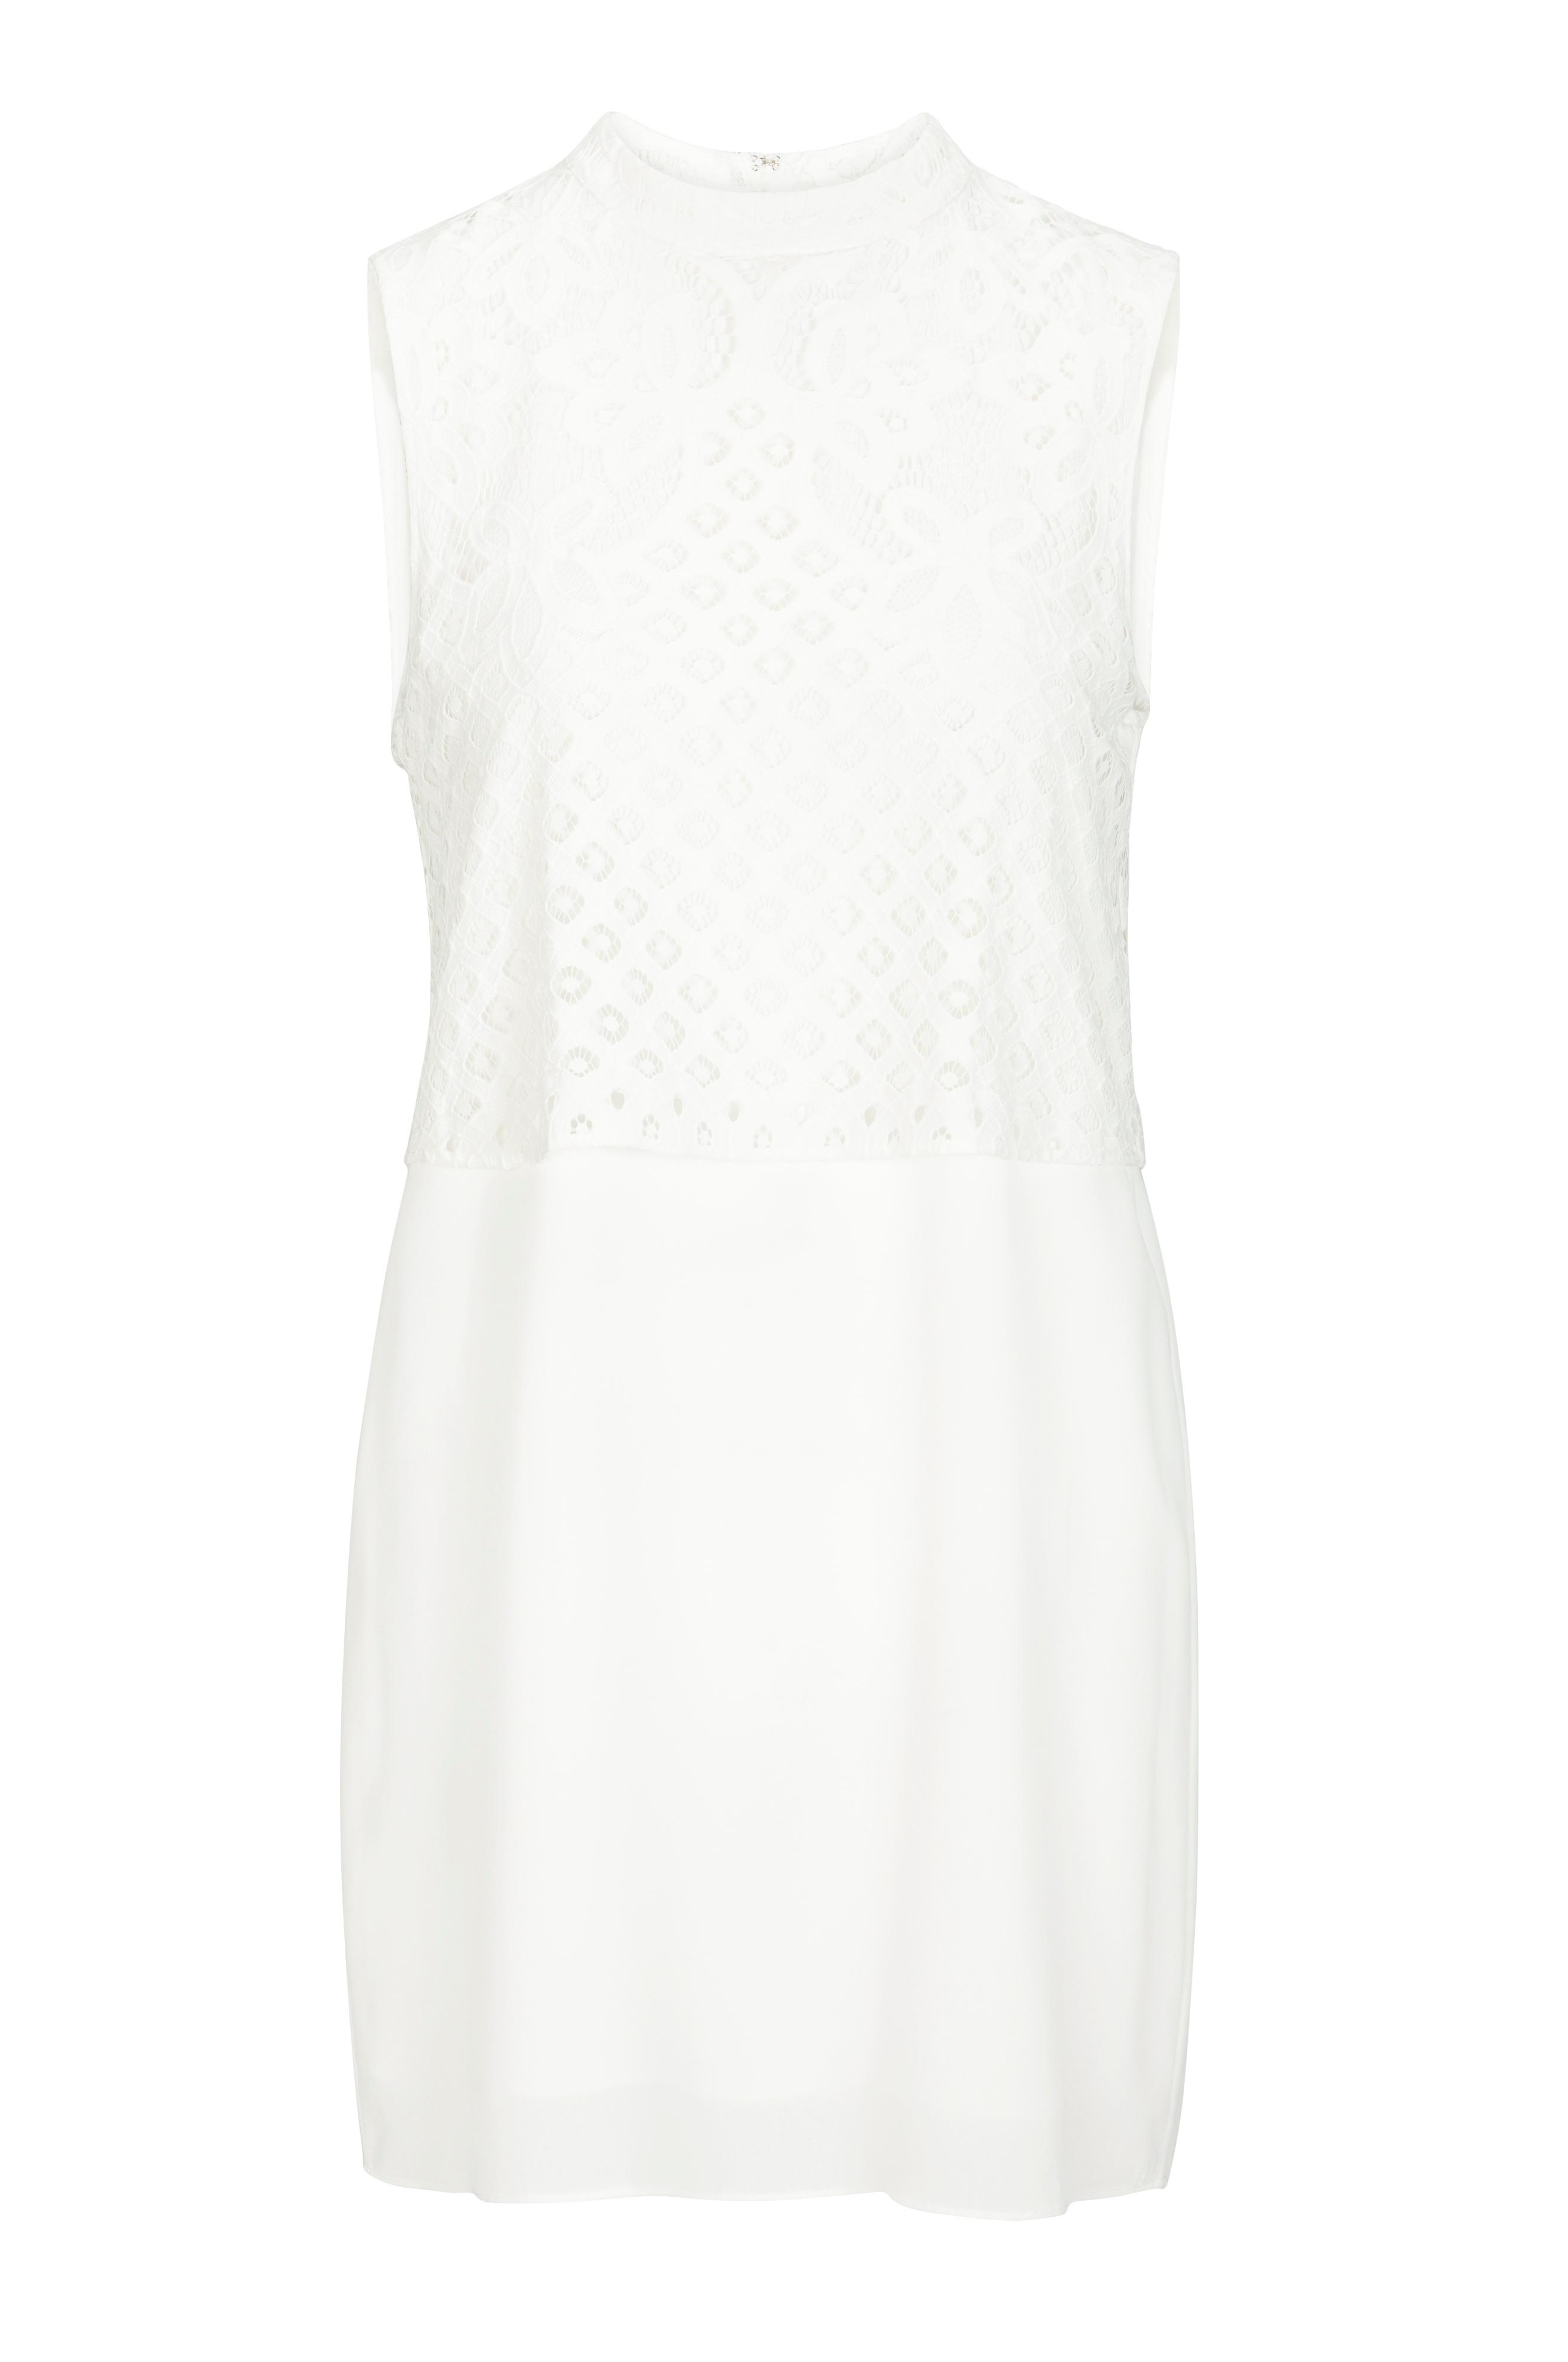 38f677333798 Buy Rett kjole. Shop every store on the internet via PricePi.com